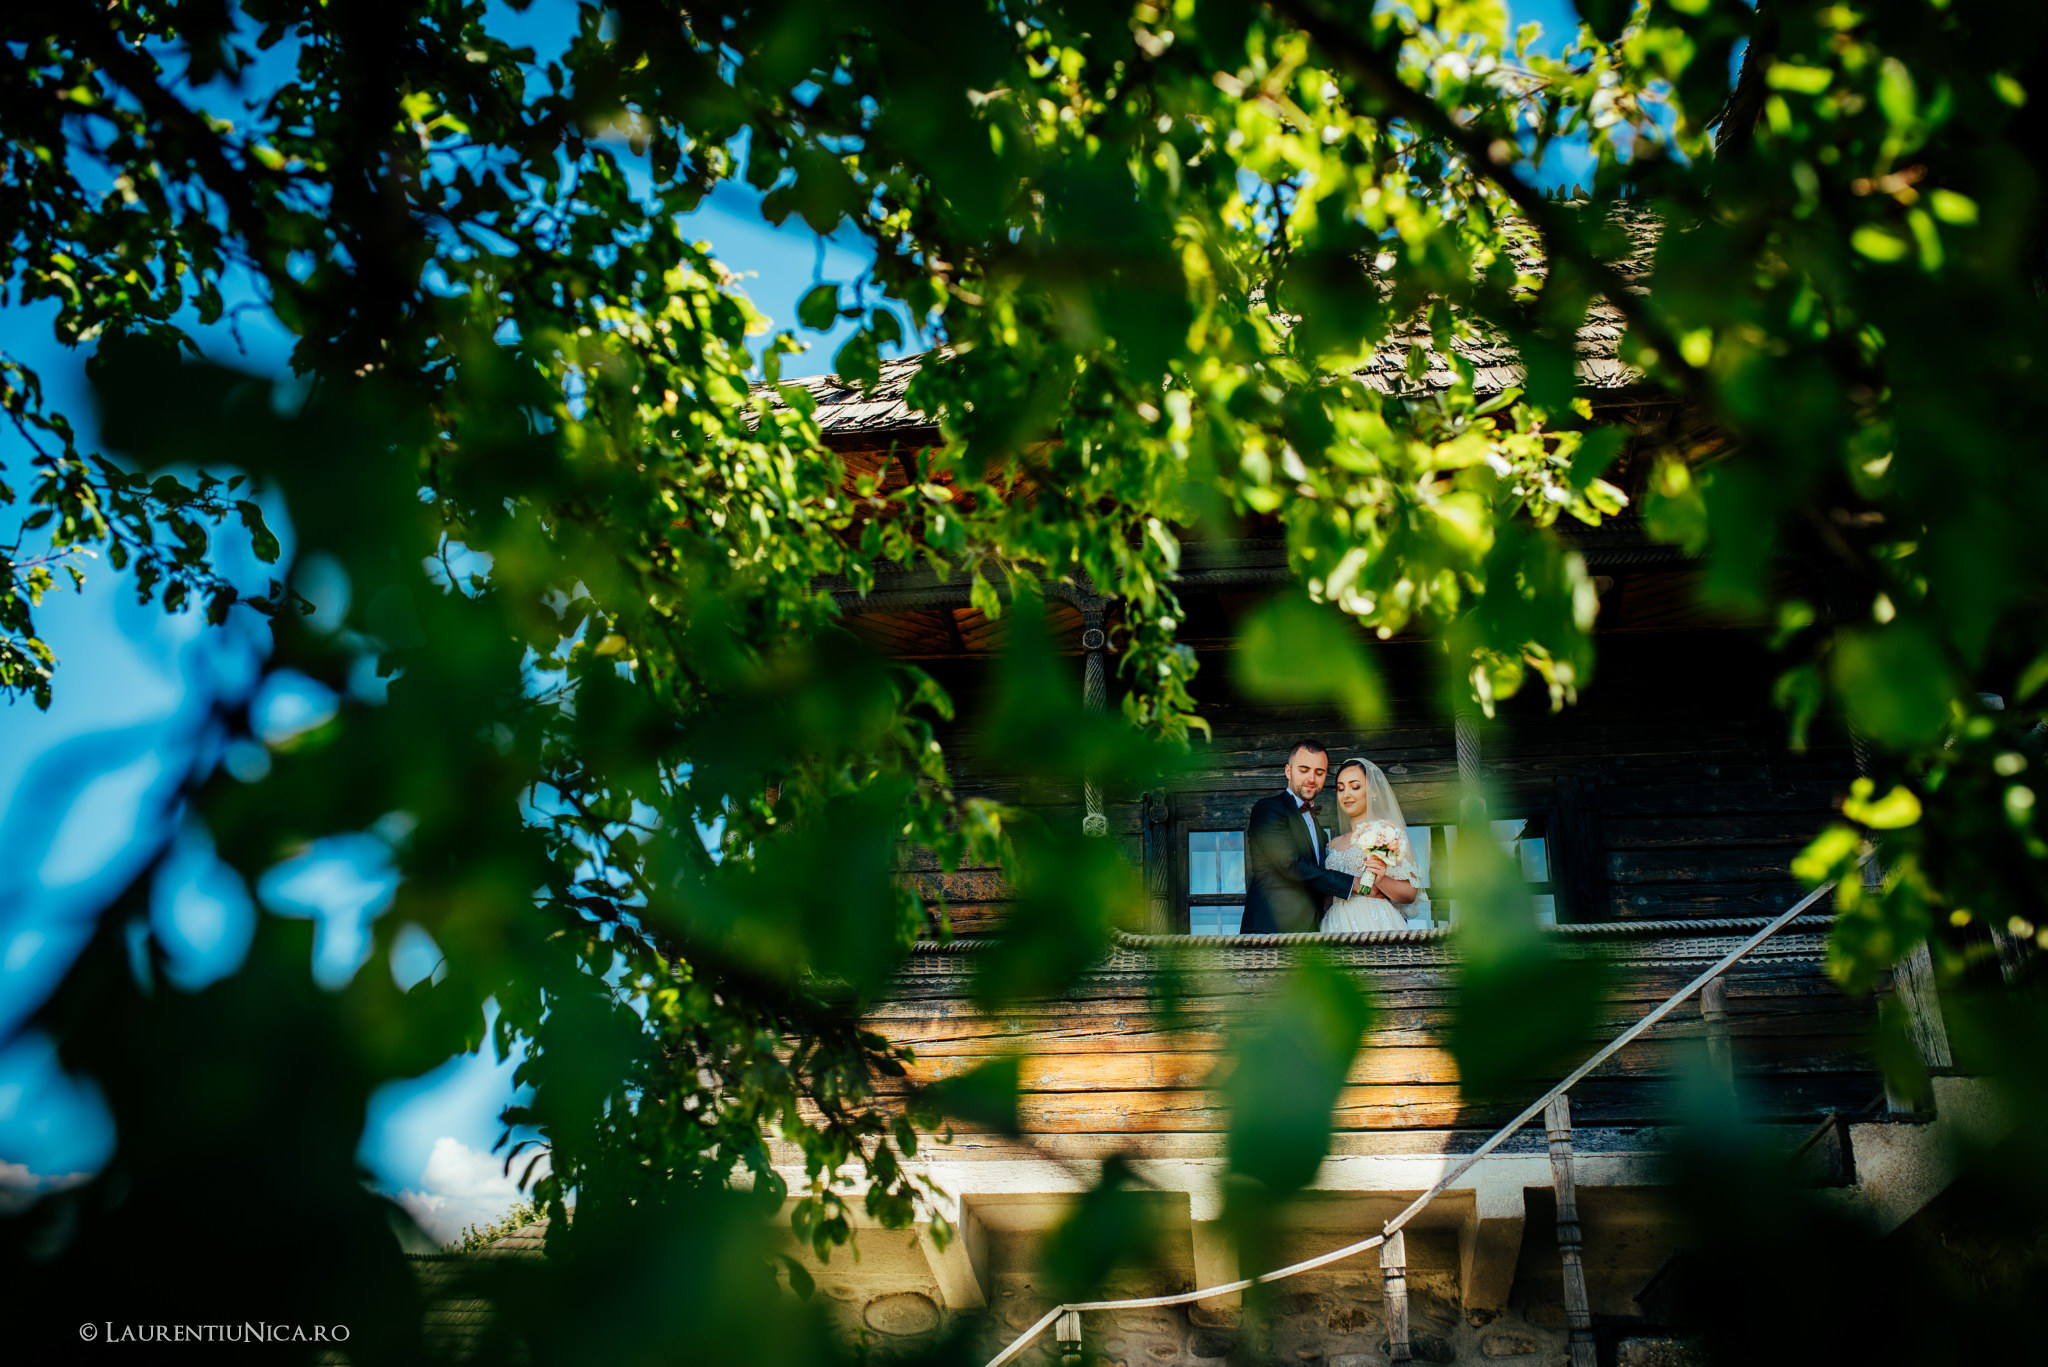 daiana si madalin fotograf nunta laurentiu nica targu jiu gorj 11 - Daiana & Madalin | Fotografii nunta | Targu-Jiu | Gorj